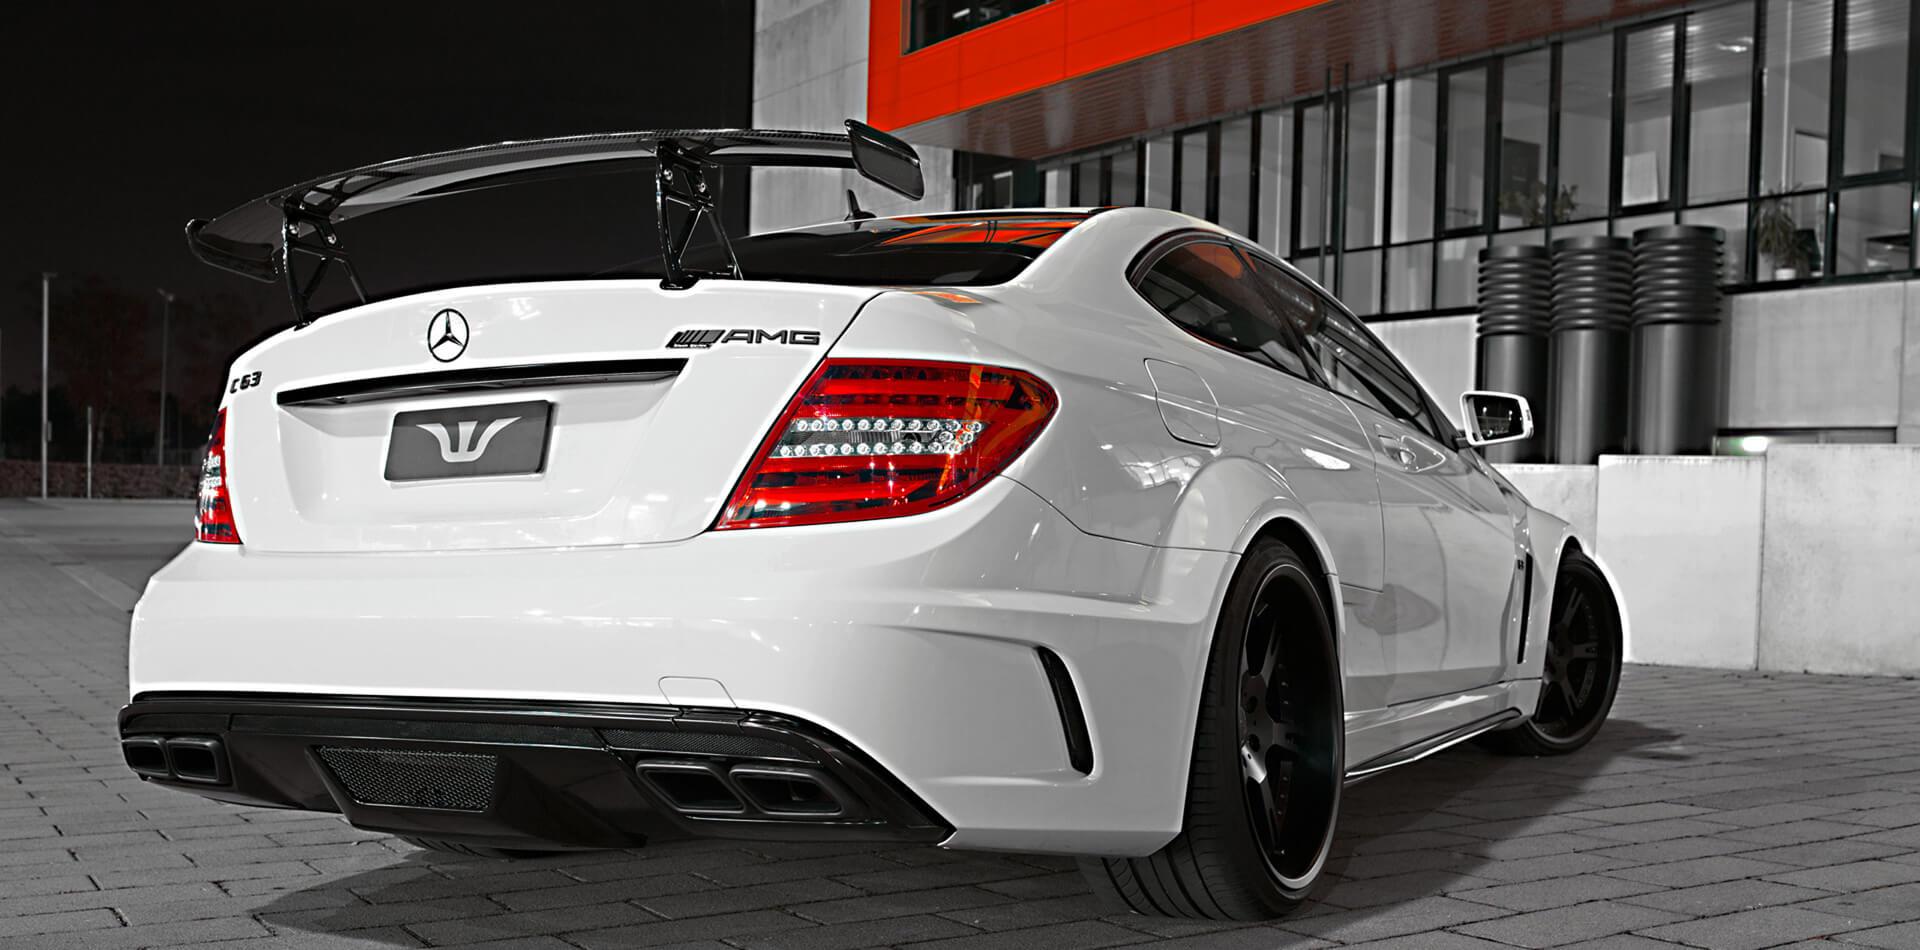 Black_Series_exhaust_Mercedes_C63_AMG